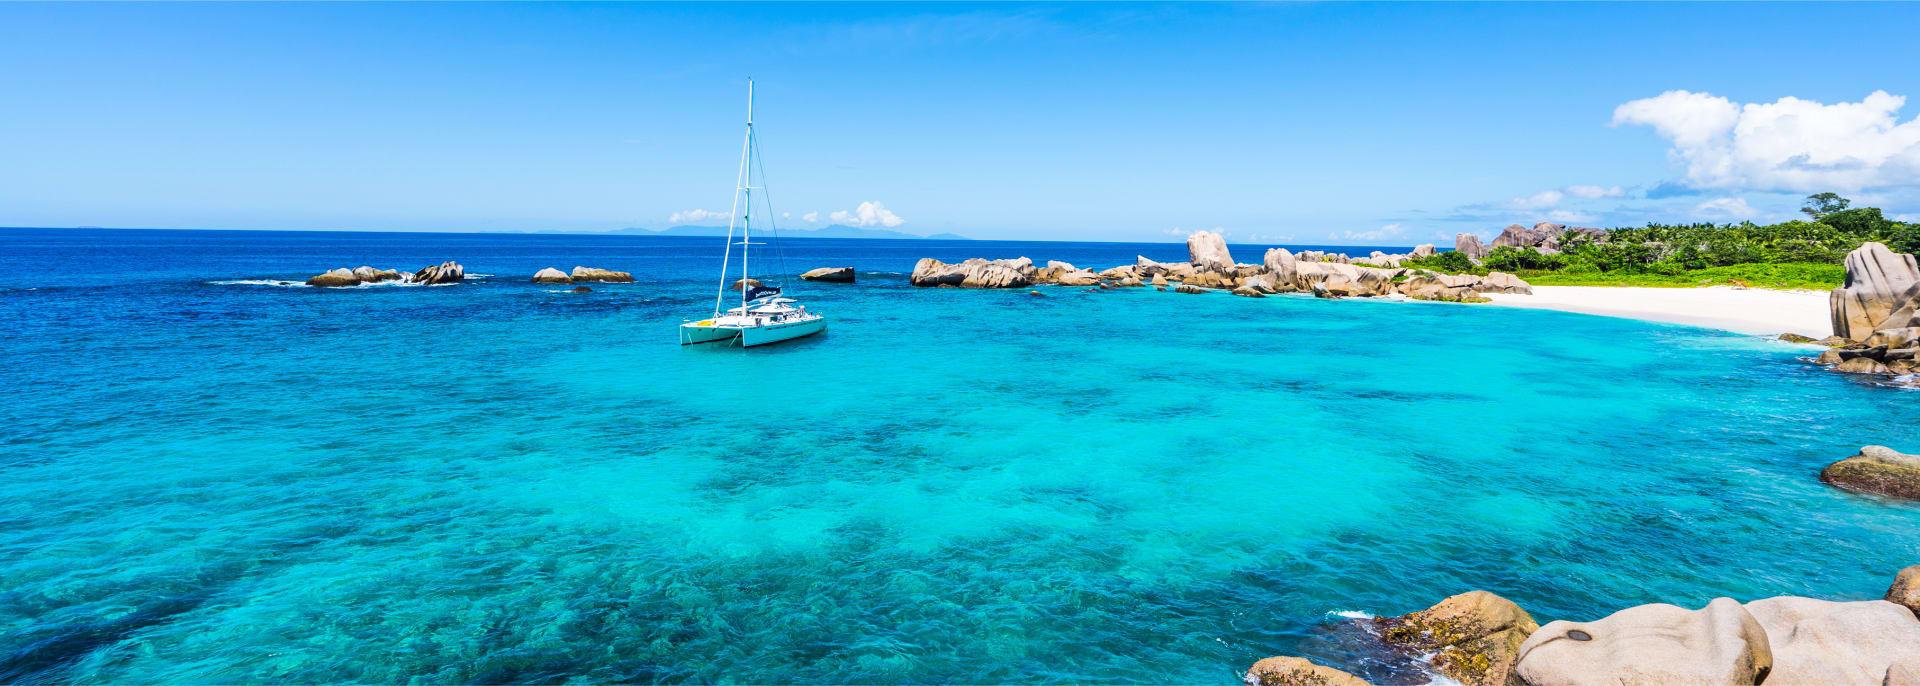 Boat-trip to Seychelles Beach